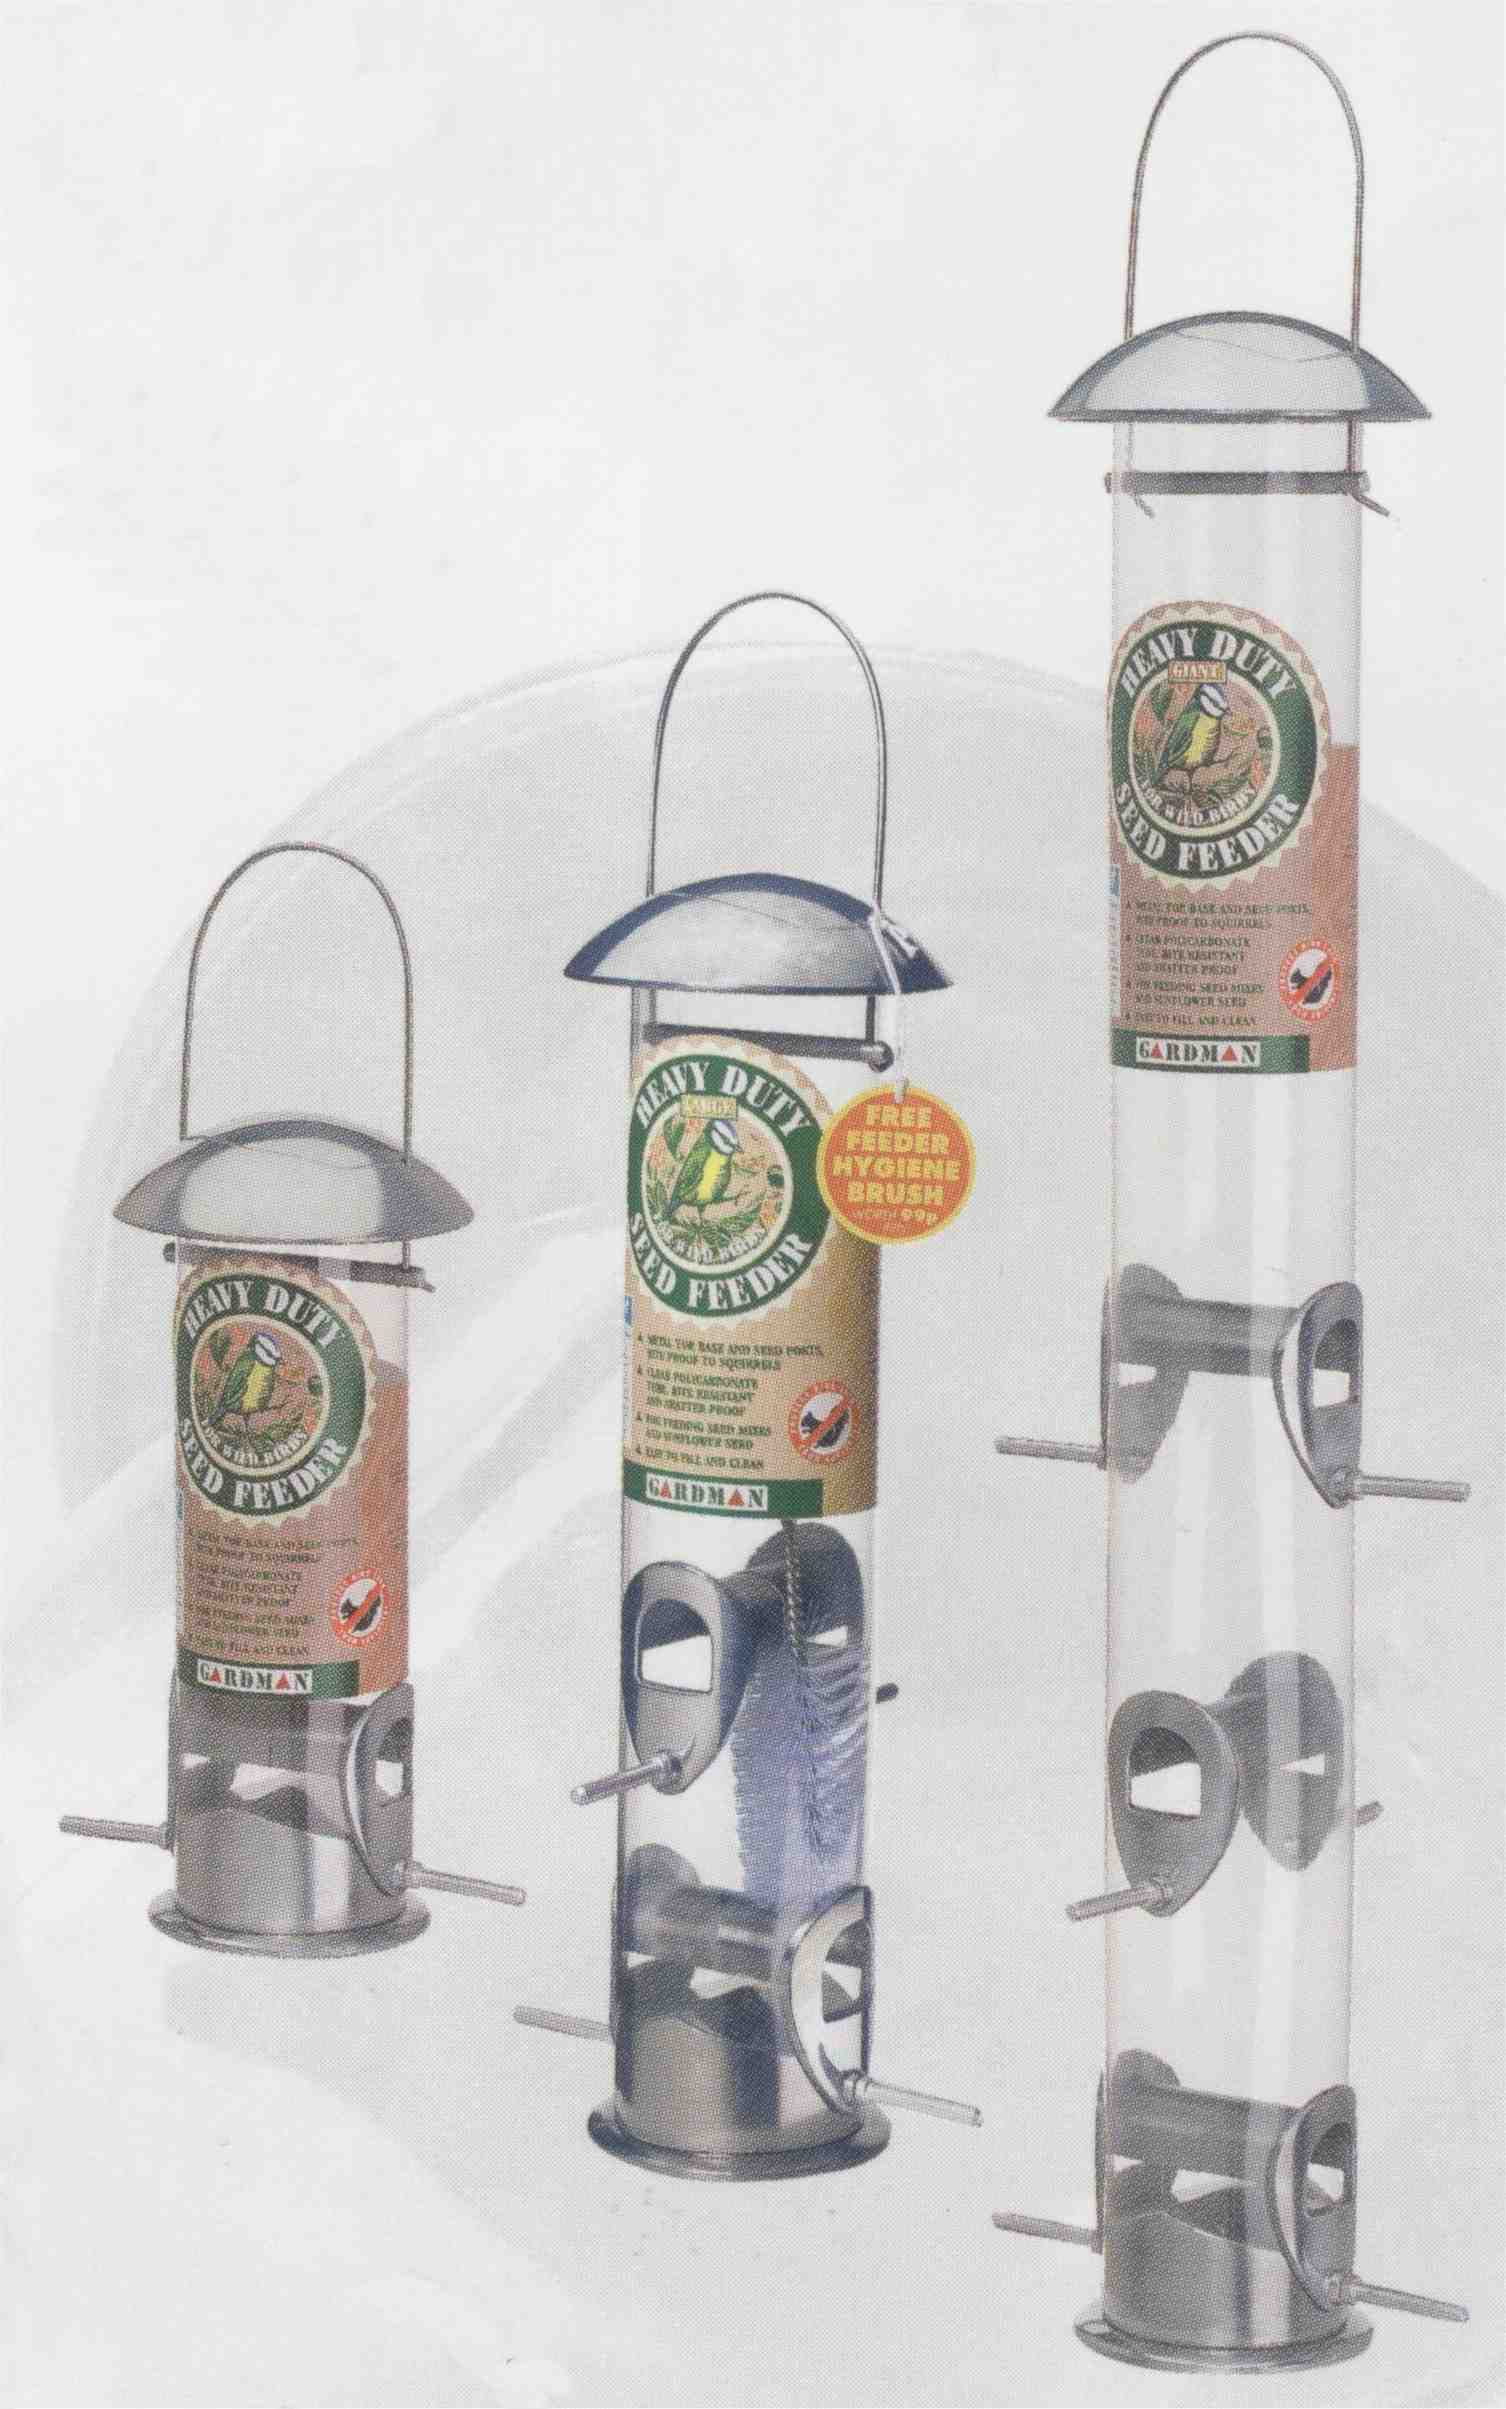 feeder handmade gardman tip projects squirrel heavy proof duty pole peanut bird junkie